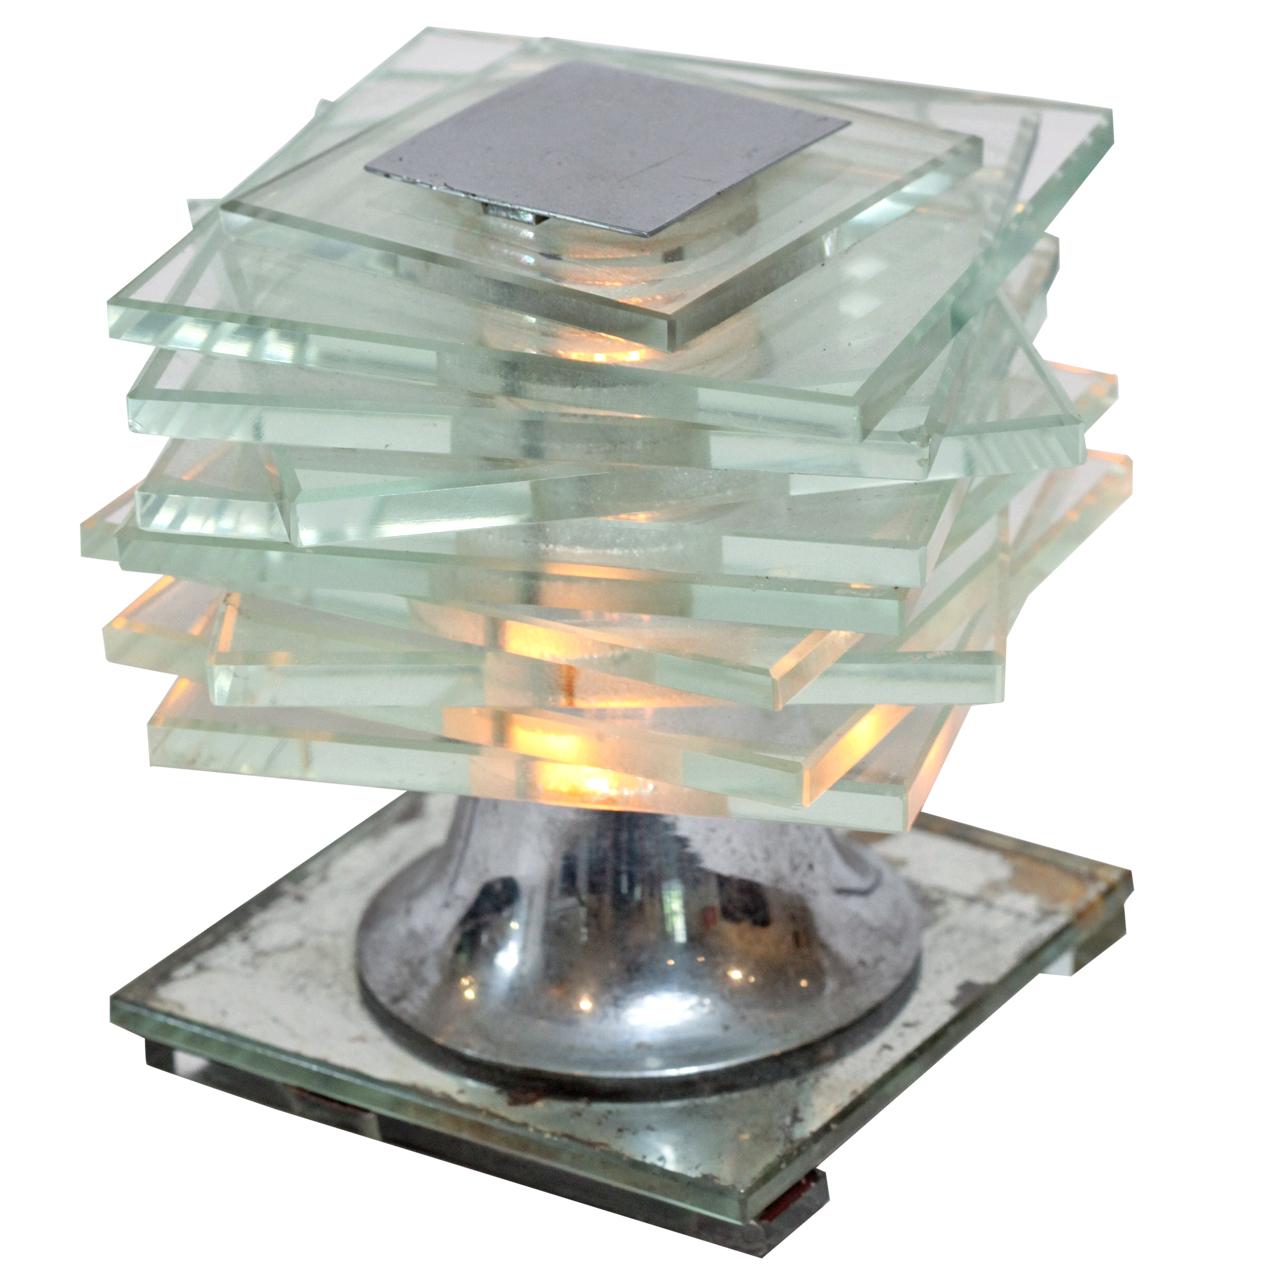 Desny table lamp.jpg